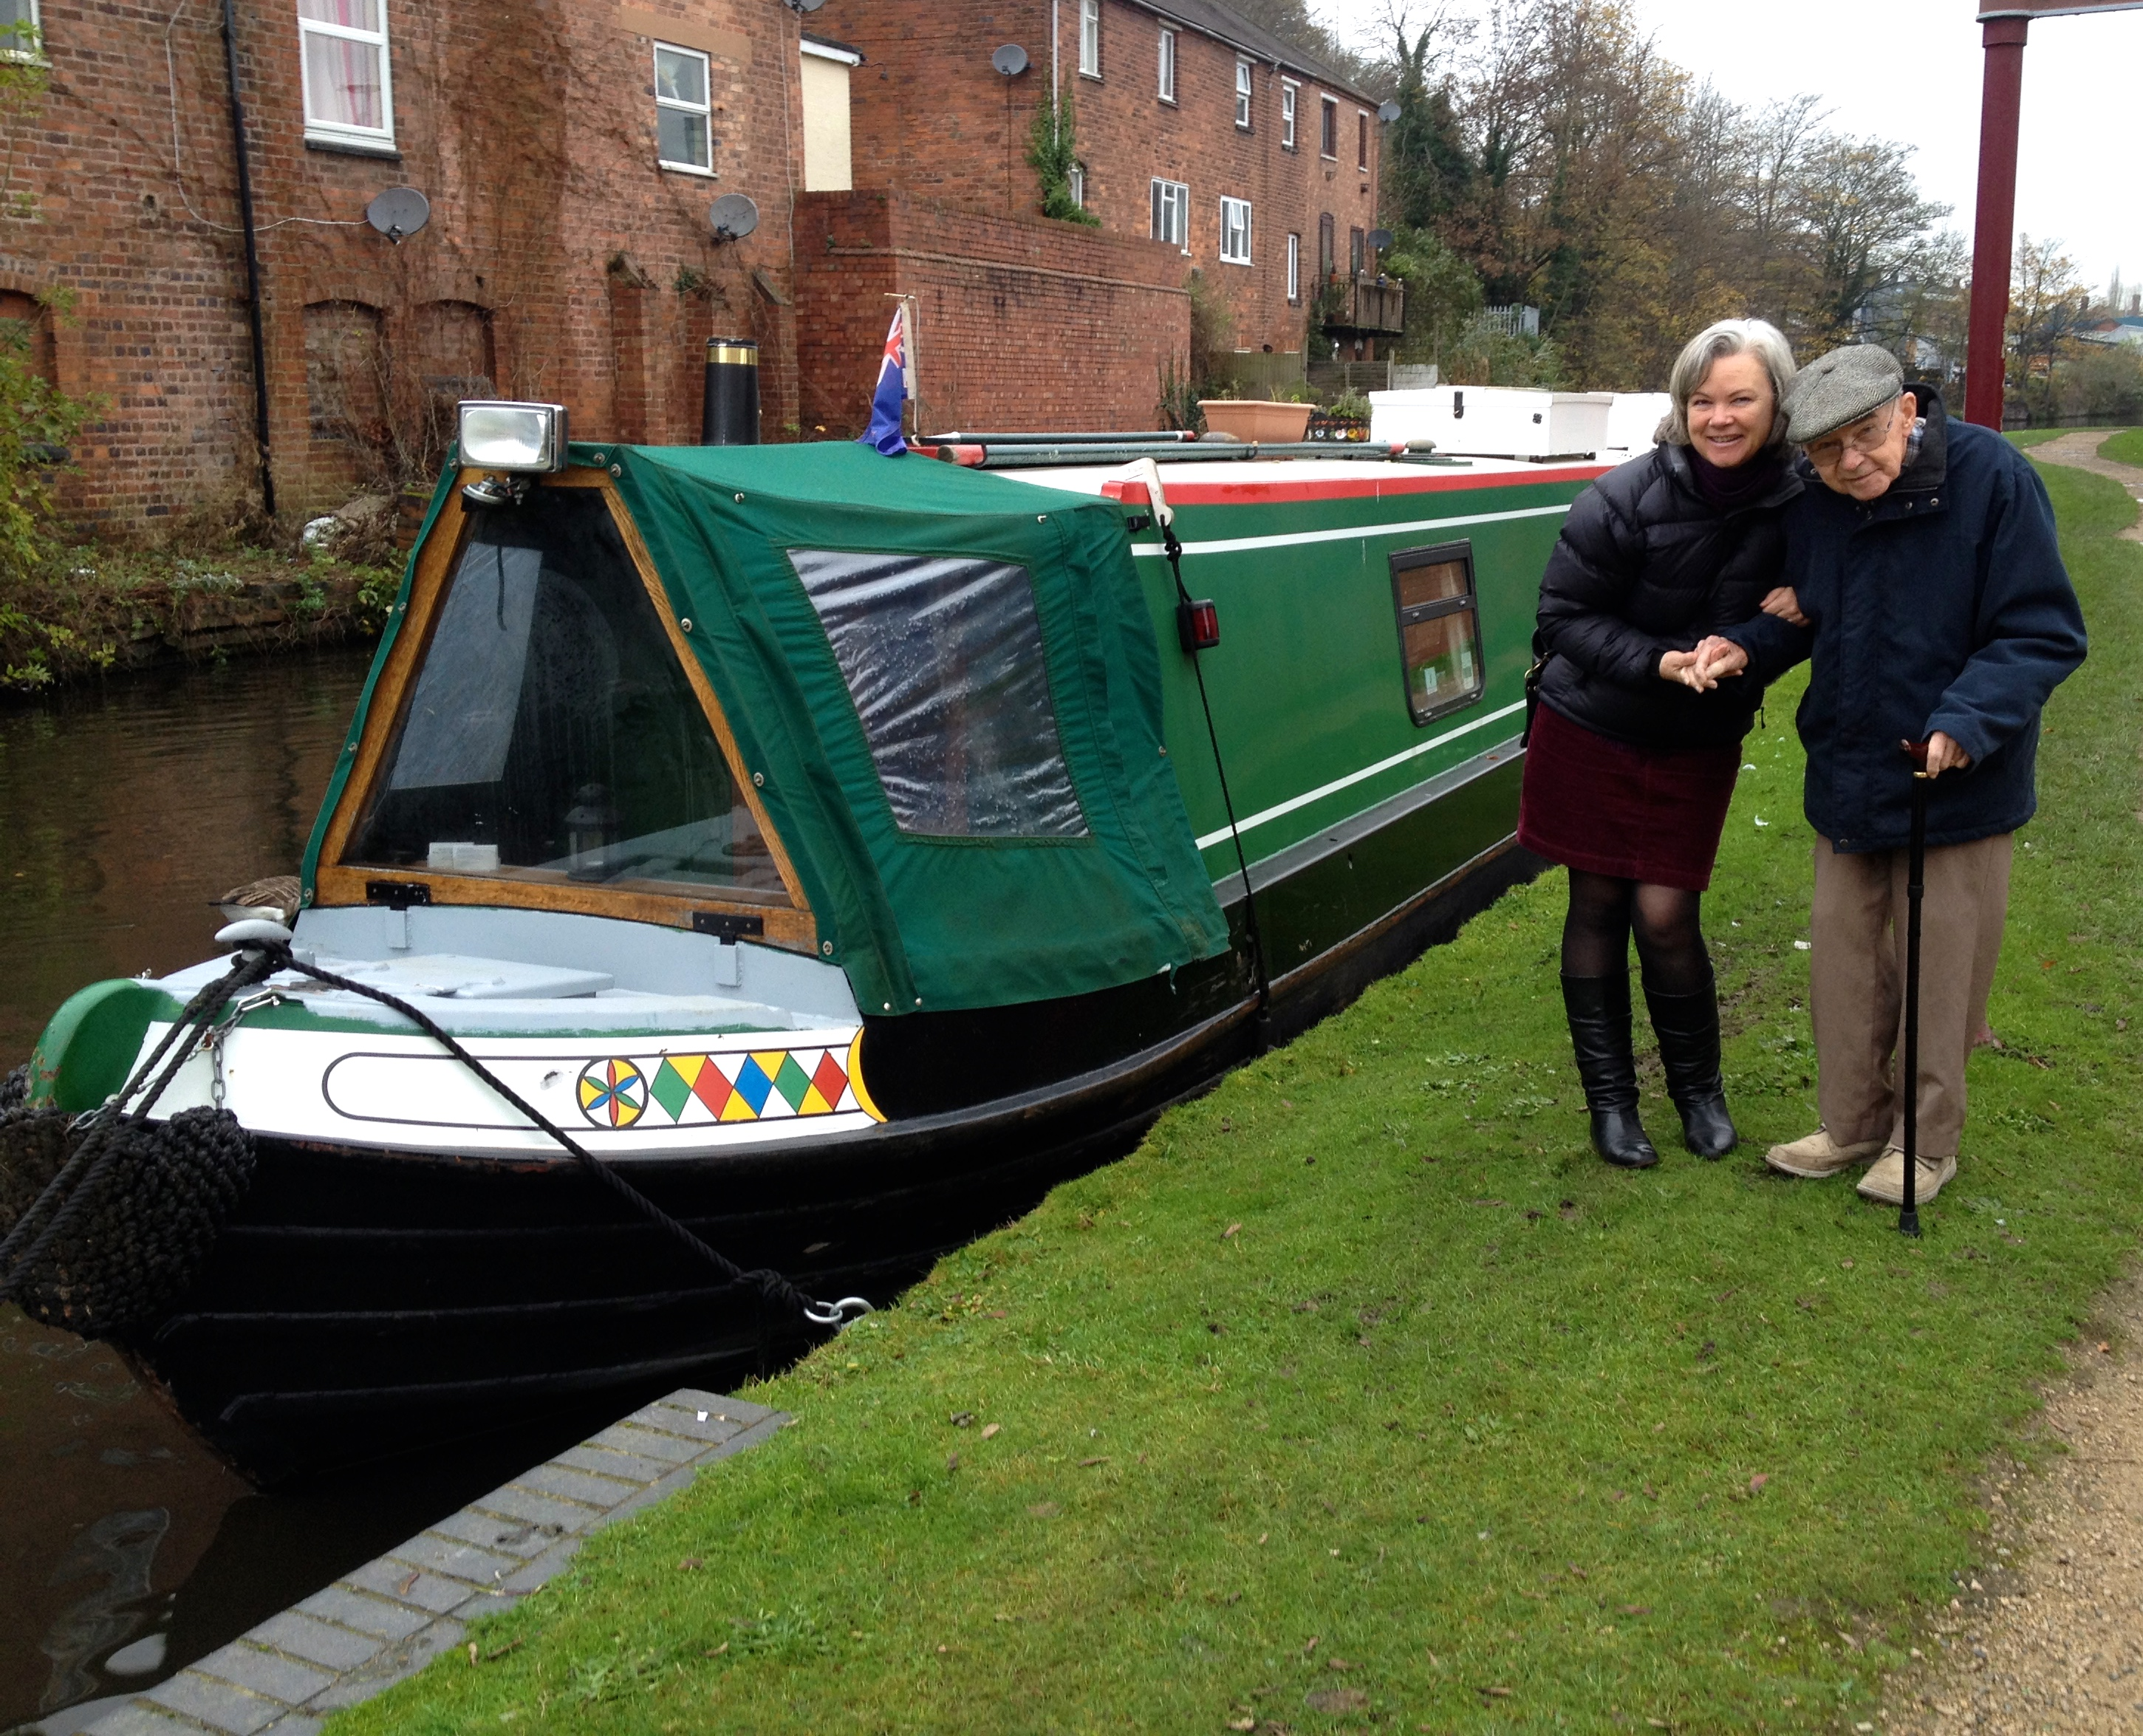 narrowboat in Kidderminster